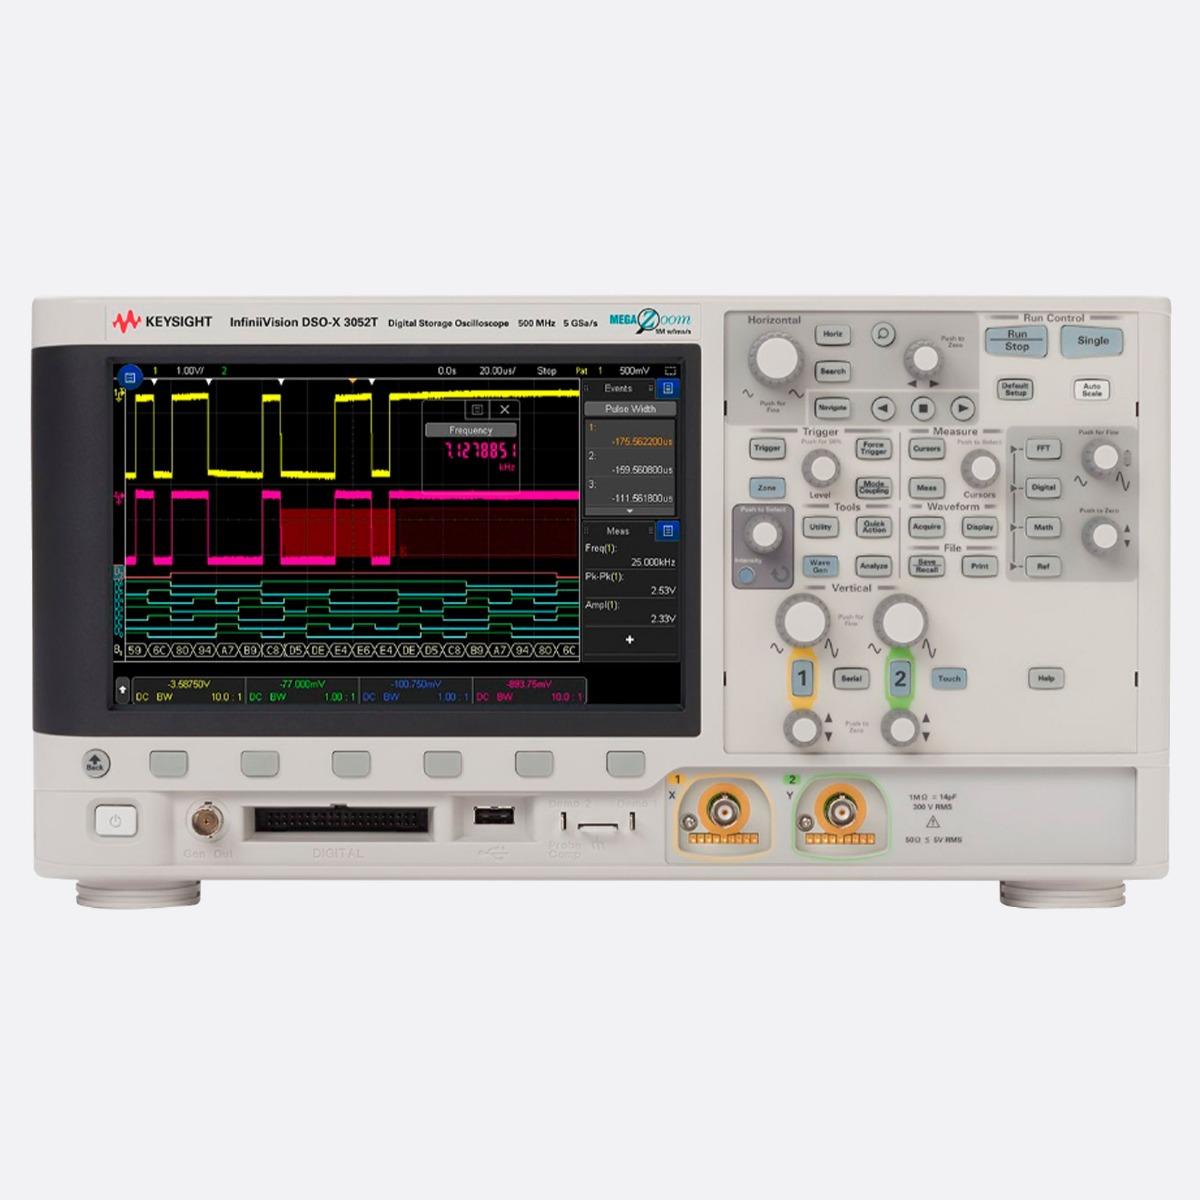 Keysight_DSOX3052T_Front_Ccontrols